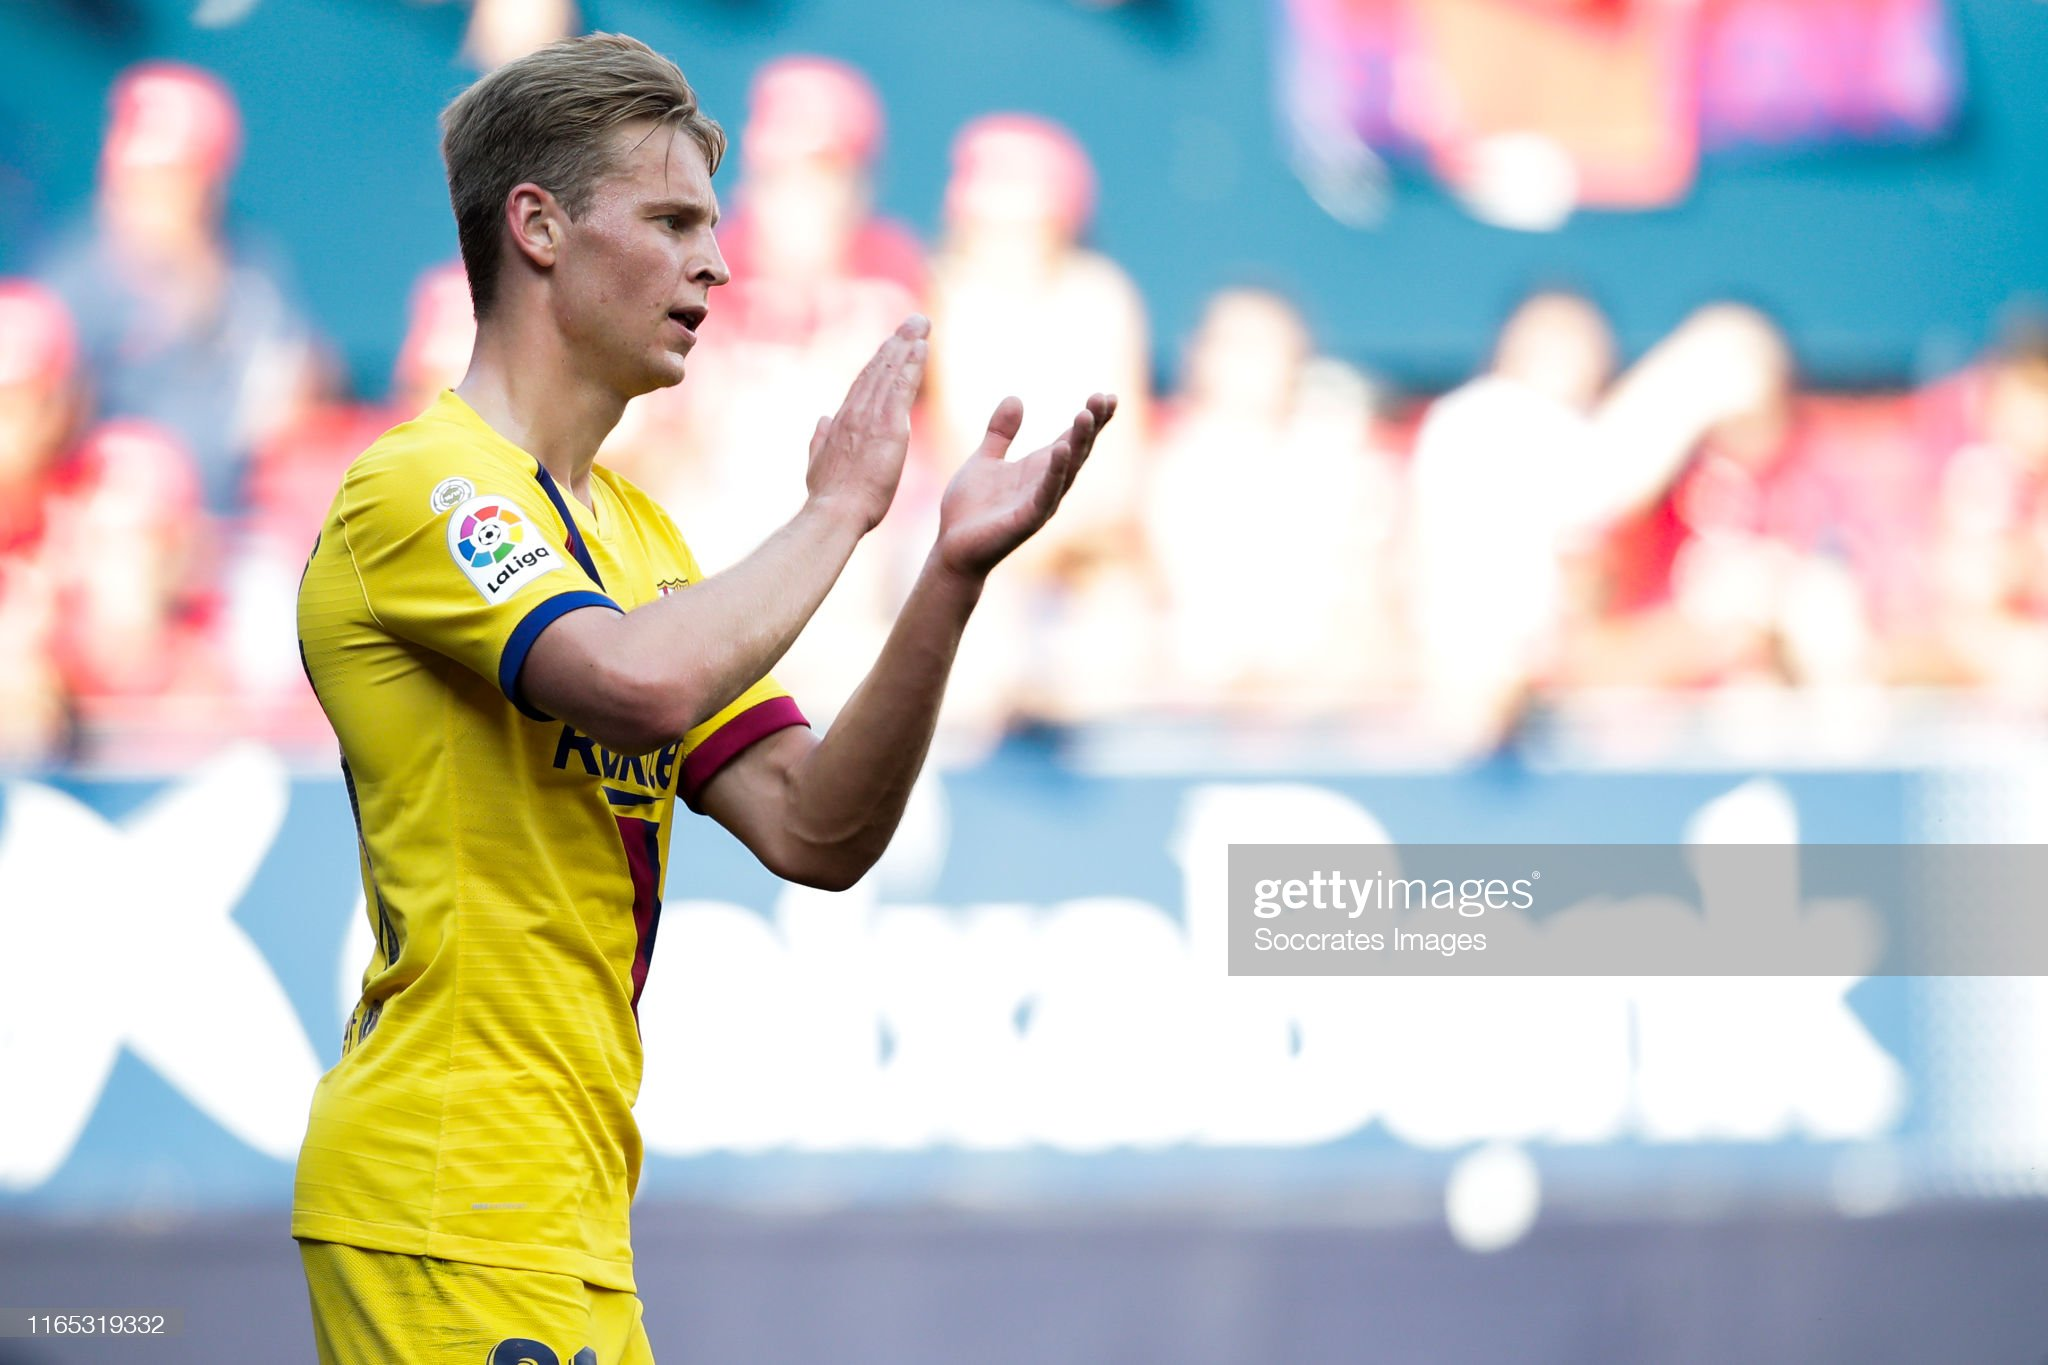 صور مباراة : أوساسونا - برشلونة 2-2 ( 31-08-2019 )  Frenkie-de-jong-of-fc-barcelona-during-the-la-liga-santander-match-picture-id1165319332?s=2048x2048